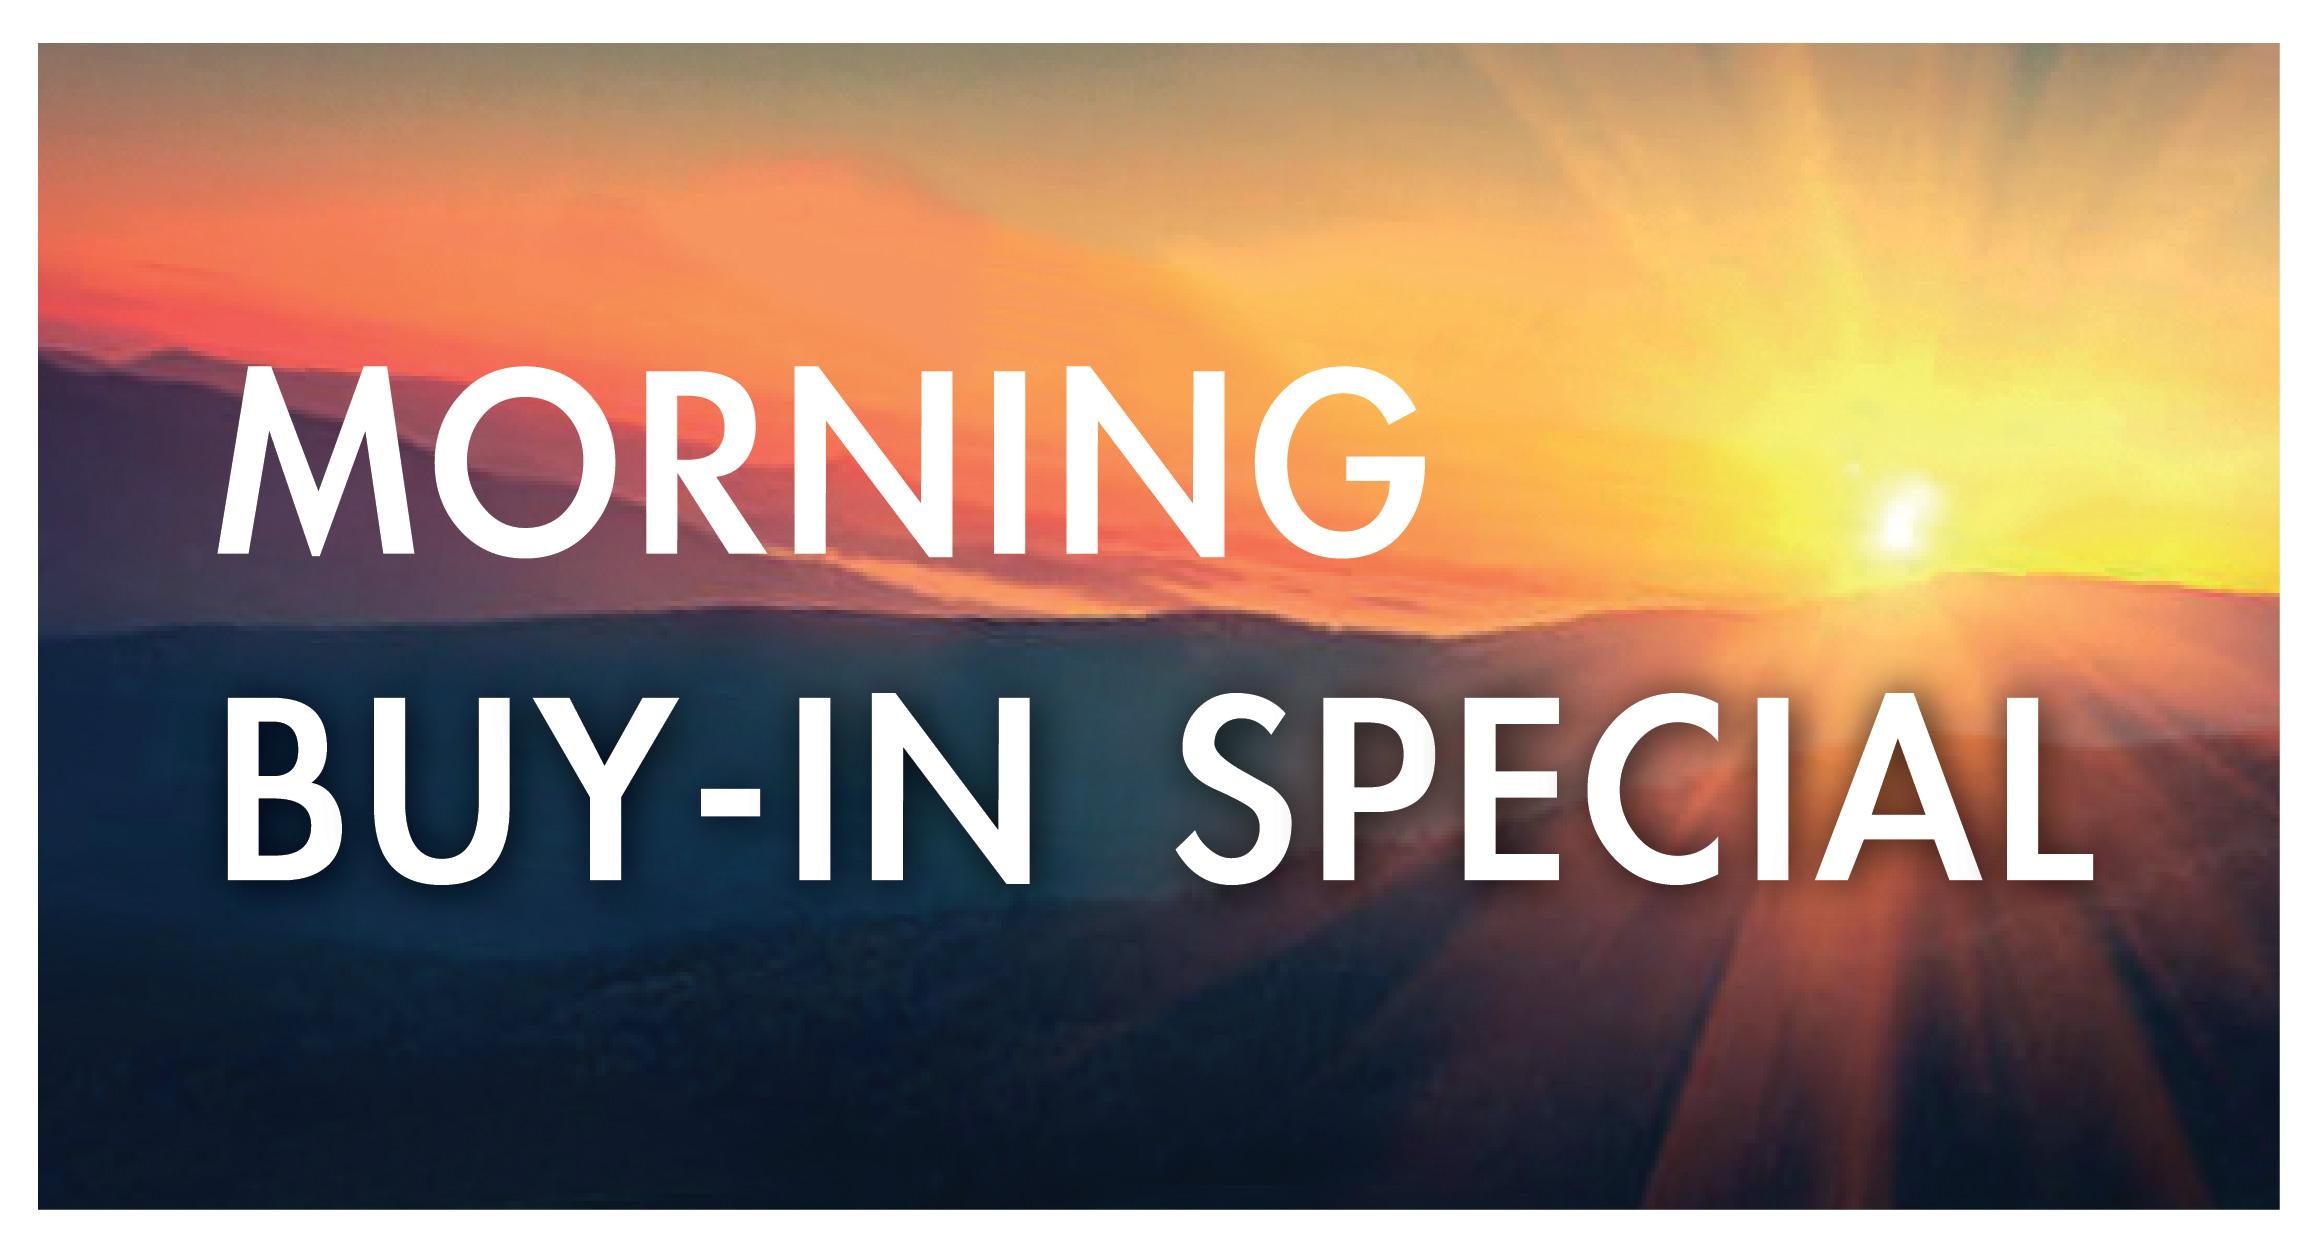 MORNING BUY-IN SPECIAL